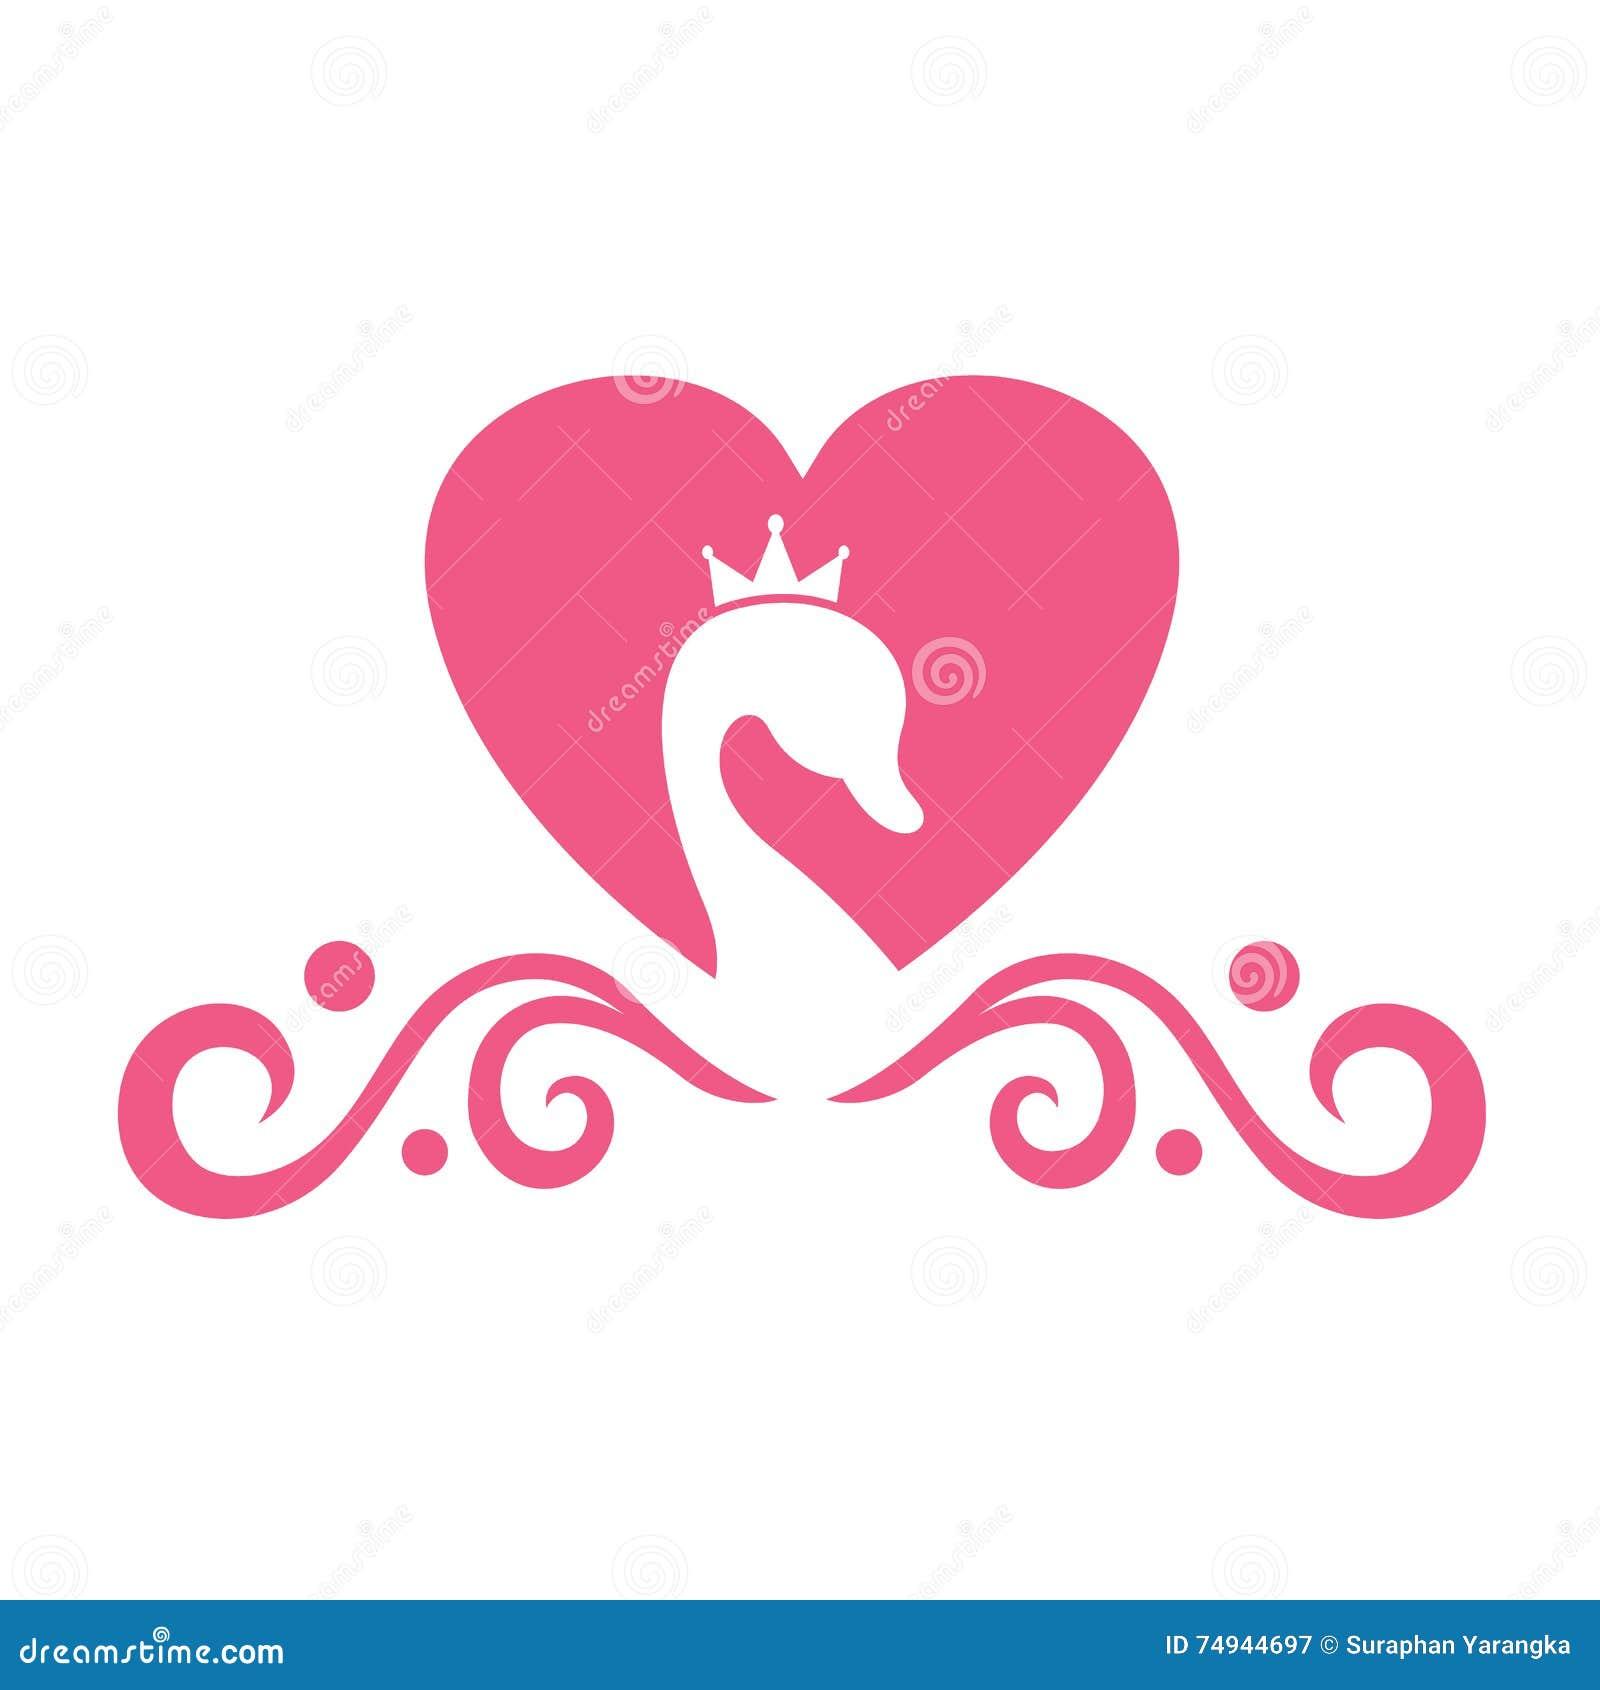 Swan Wedding Logo stock vector. Illustration of business - 74944697